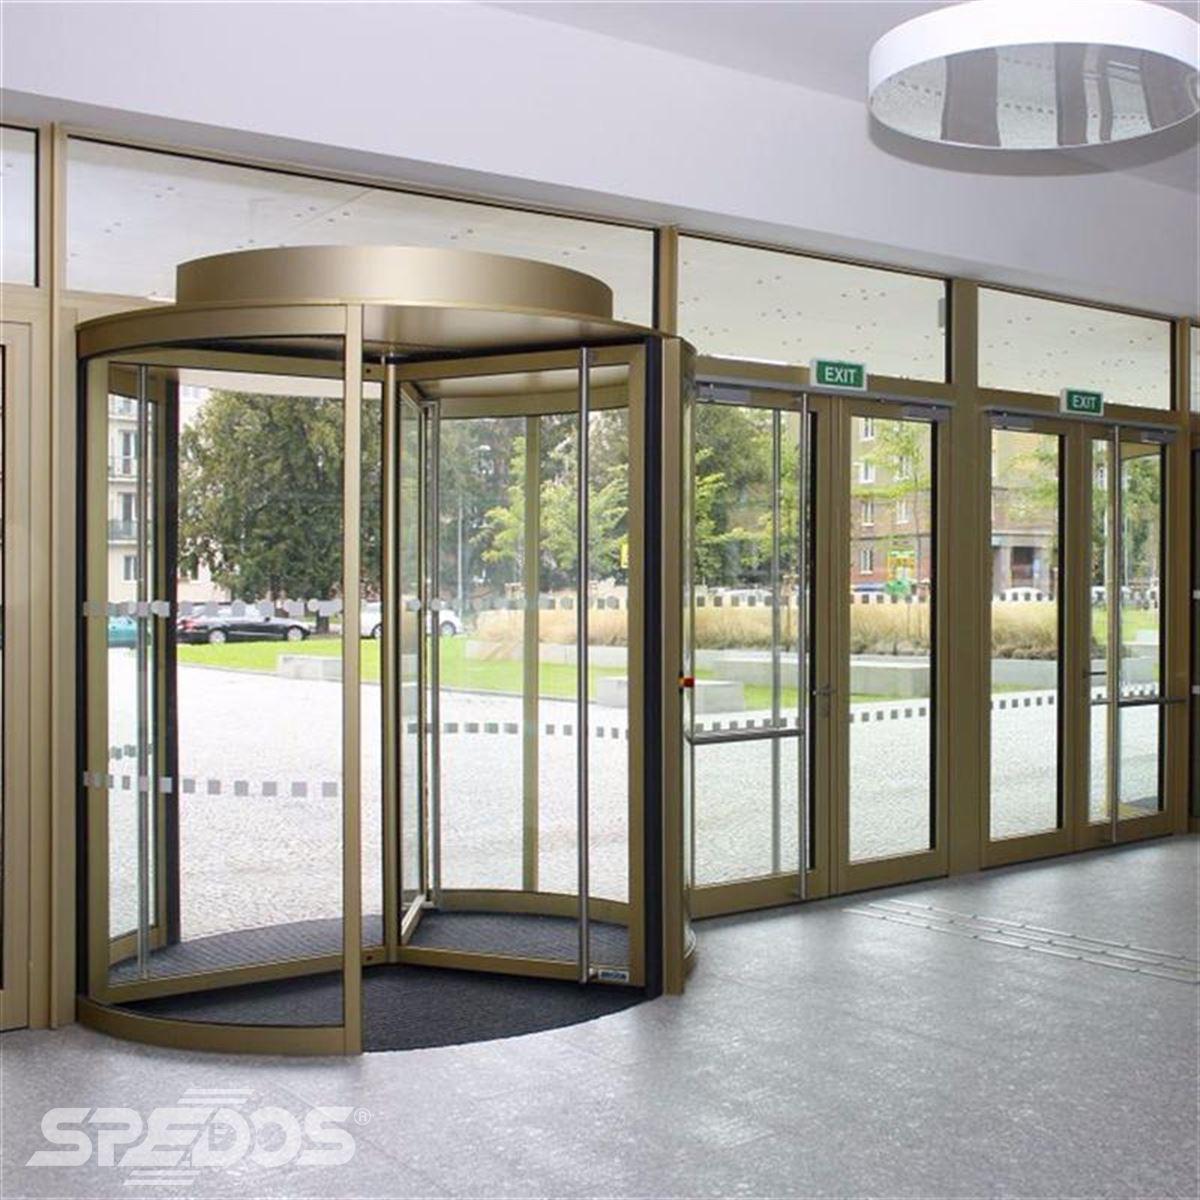 Karuselové dveře Tourniket pro Masarykovu univerzitu 1